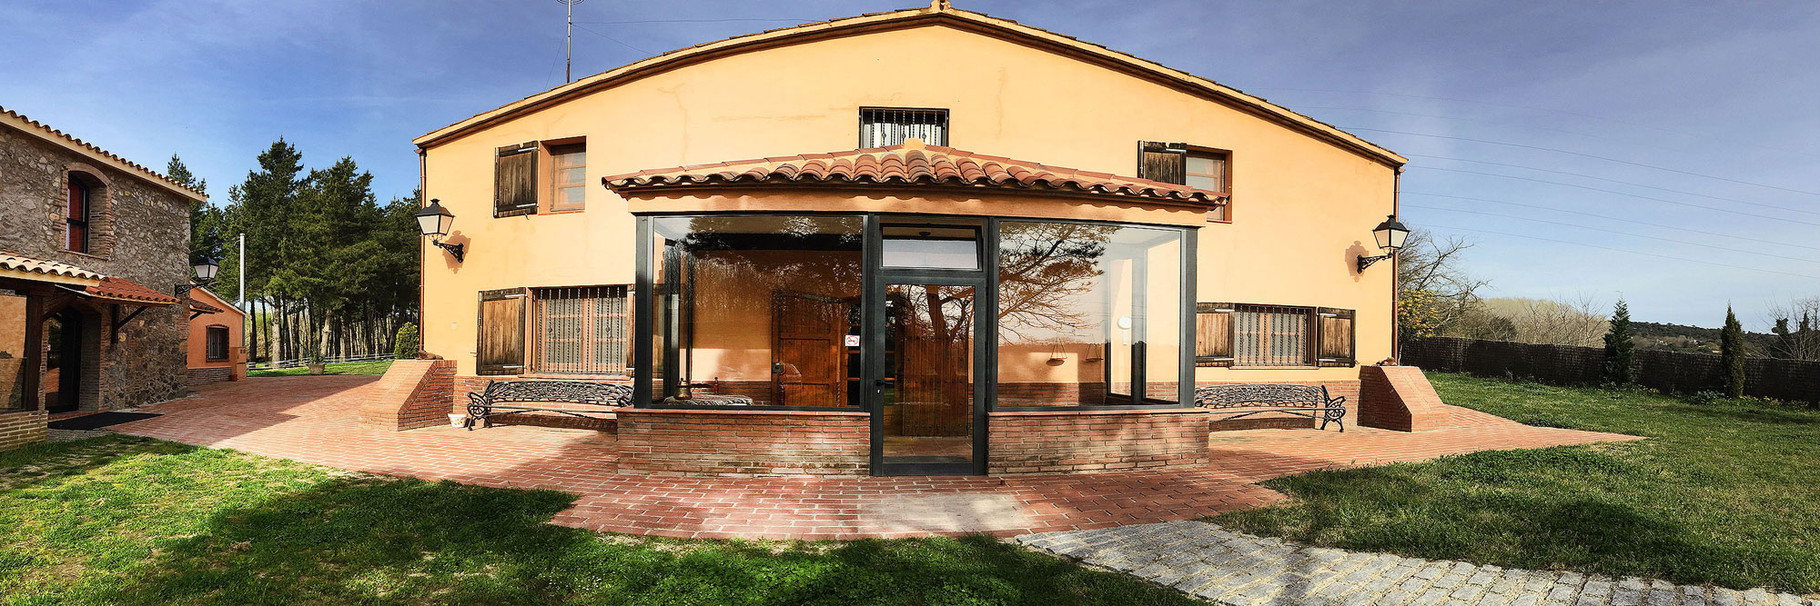 Casa Taronja: un espai on gaudir en família